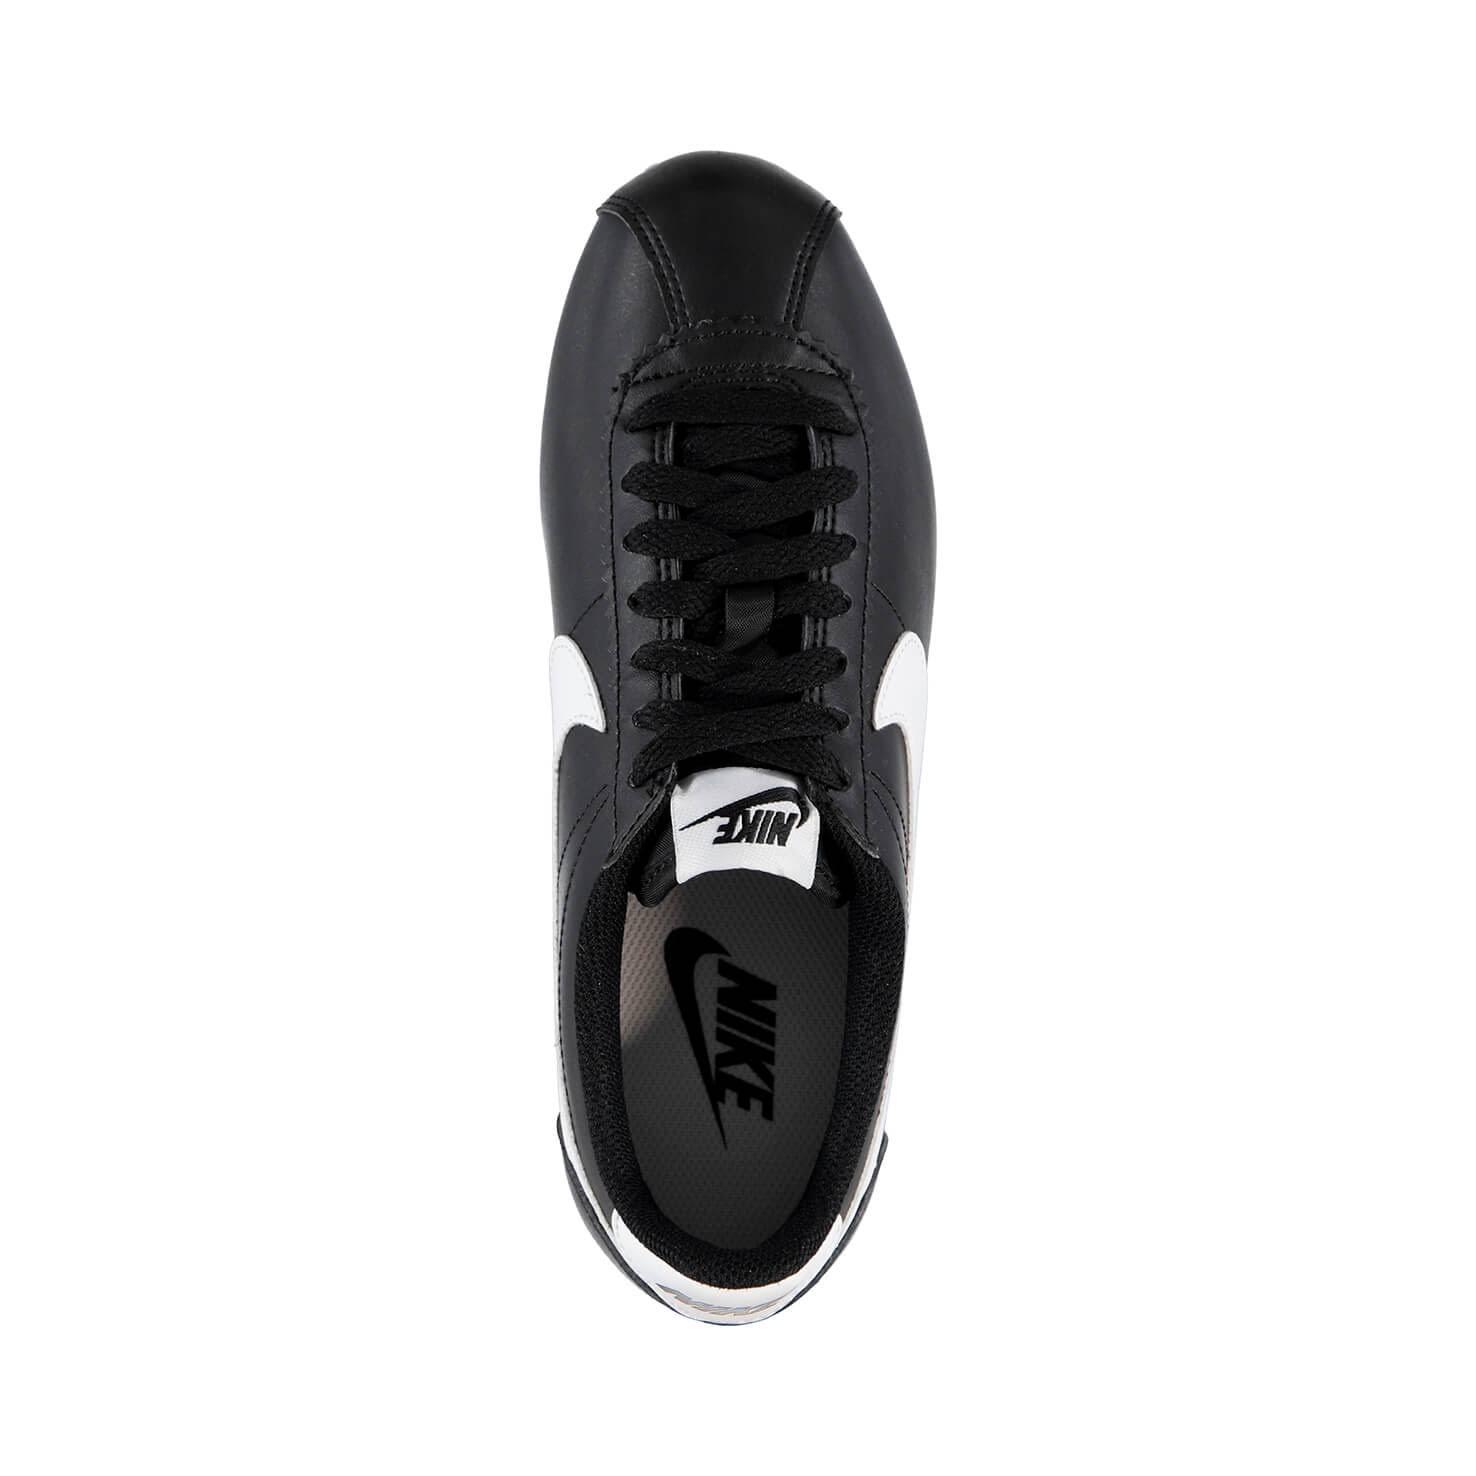 Siyah Classic Ayakkabı 010 Cortez 807471 Wmns Nike Leather 38 OqSH8Ow